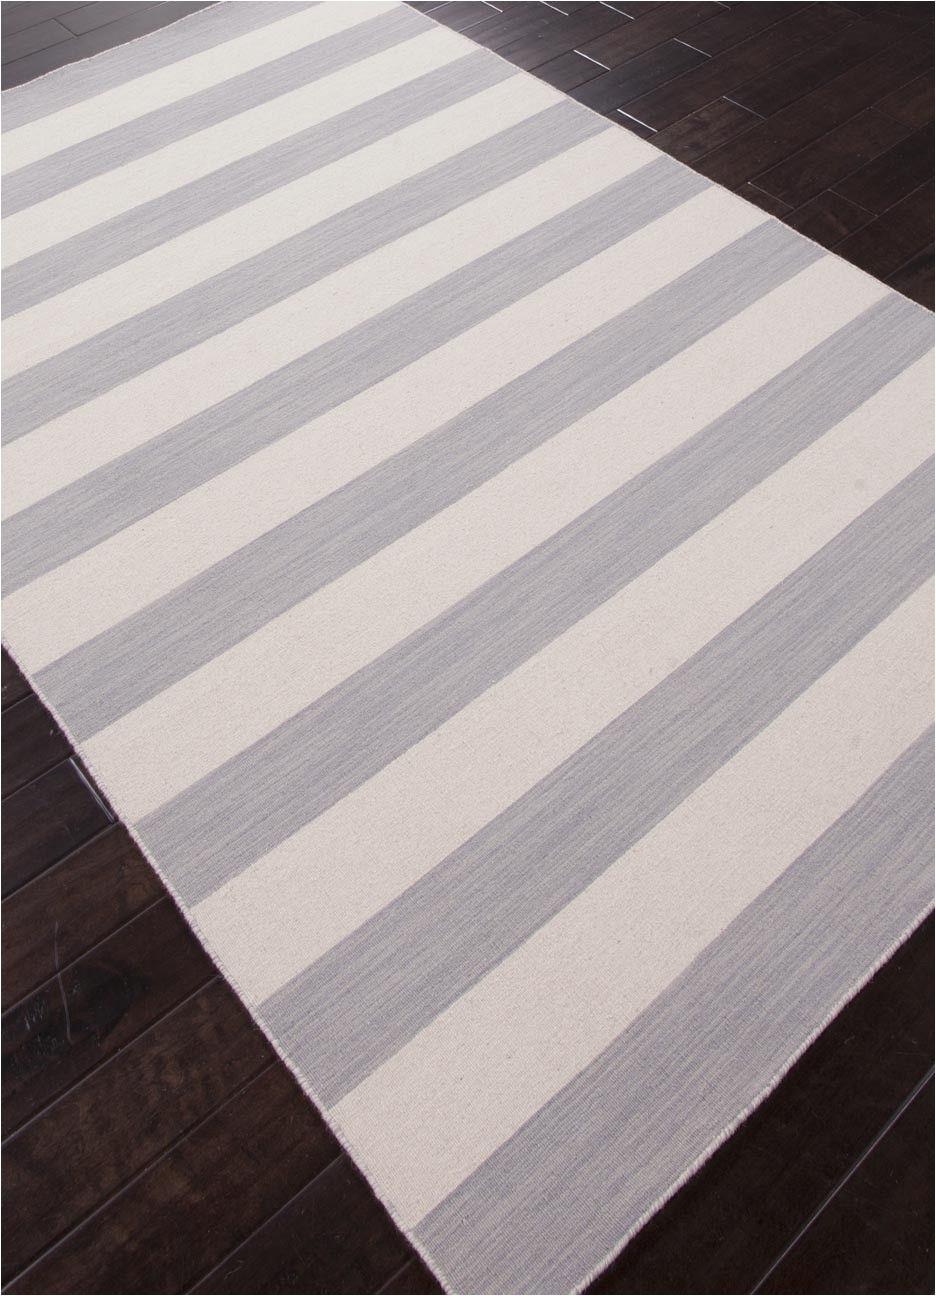 Gray and White Striped area Rug Dias Collection From Jaipur Gray and White Striped area